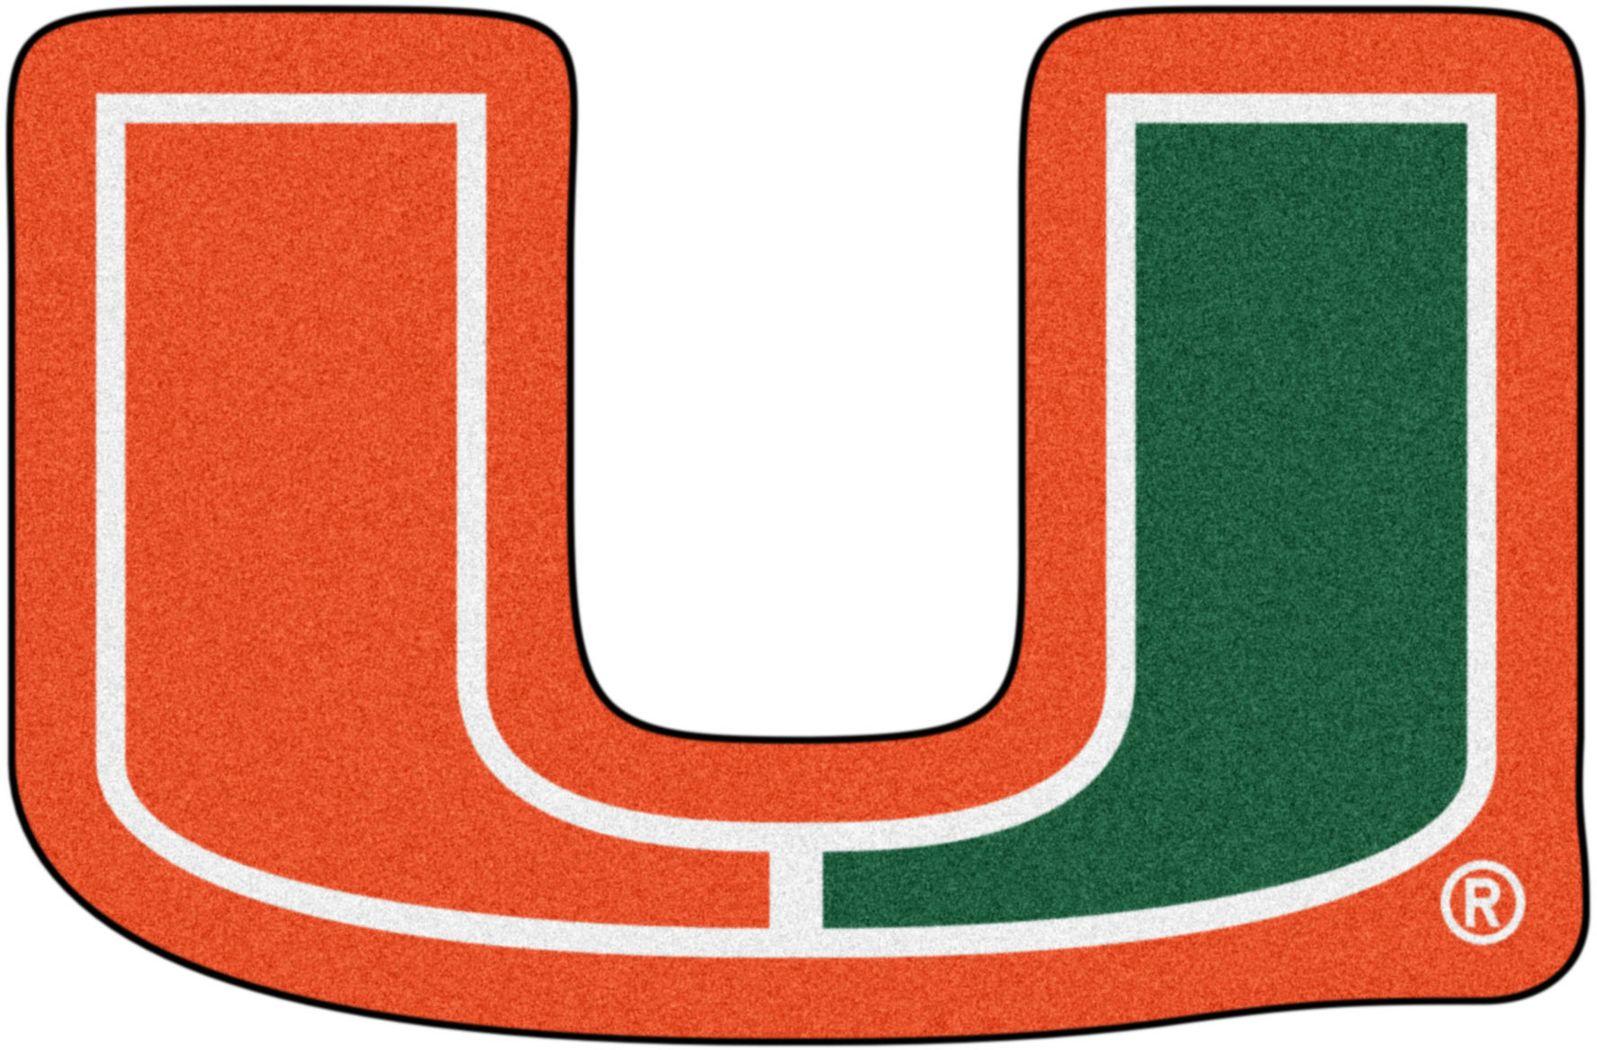 "NCAA Football Mascot University of Miami 1'6"" x 2' Rug"